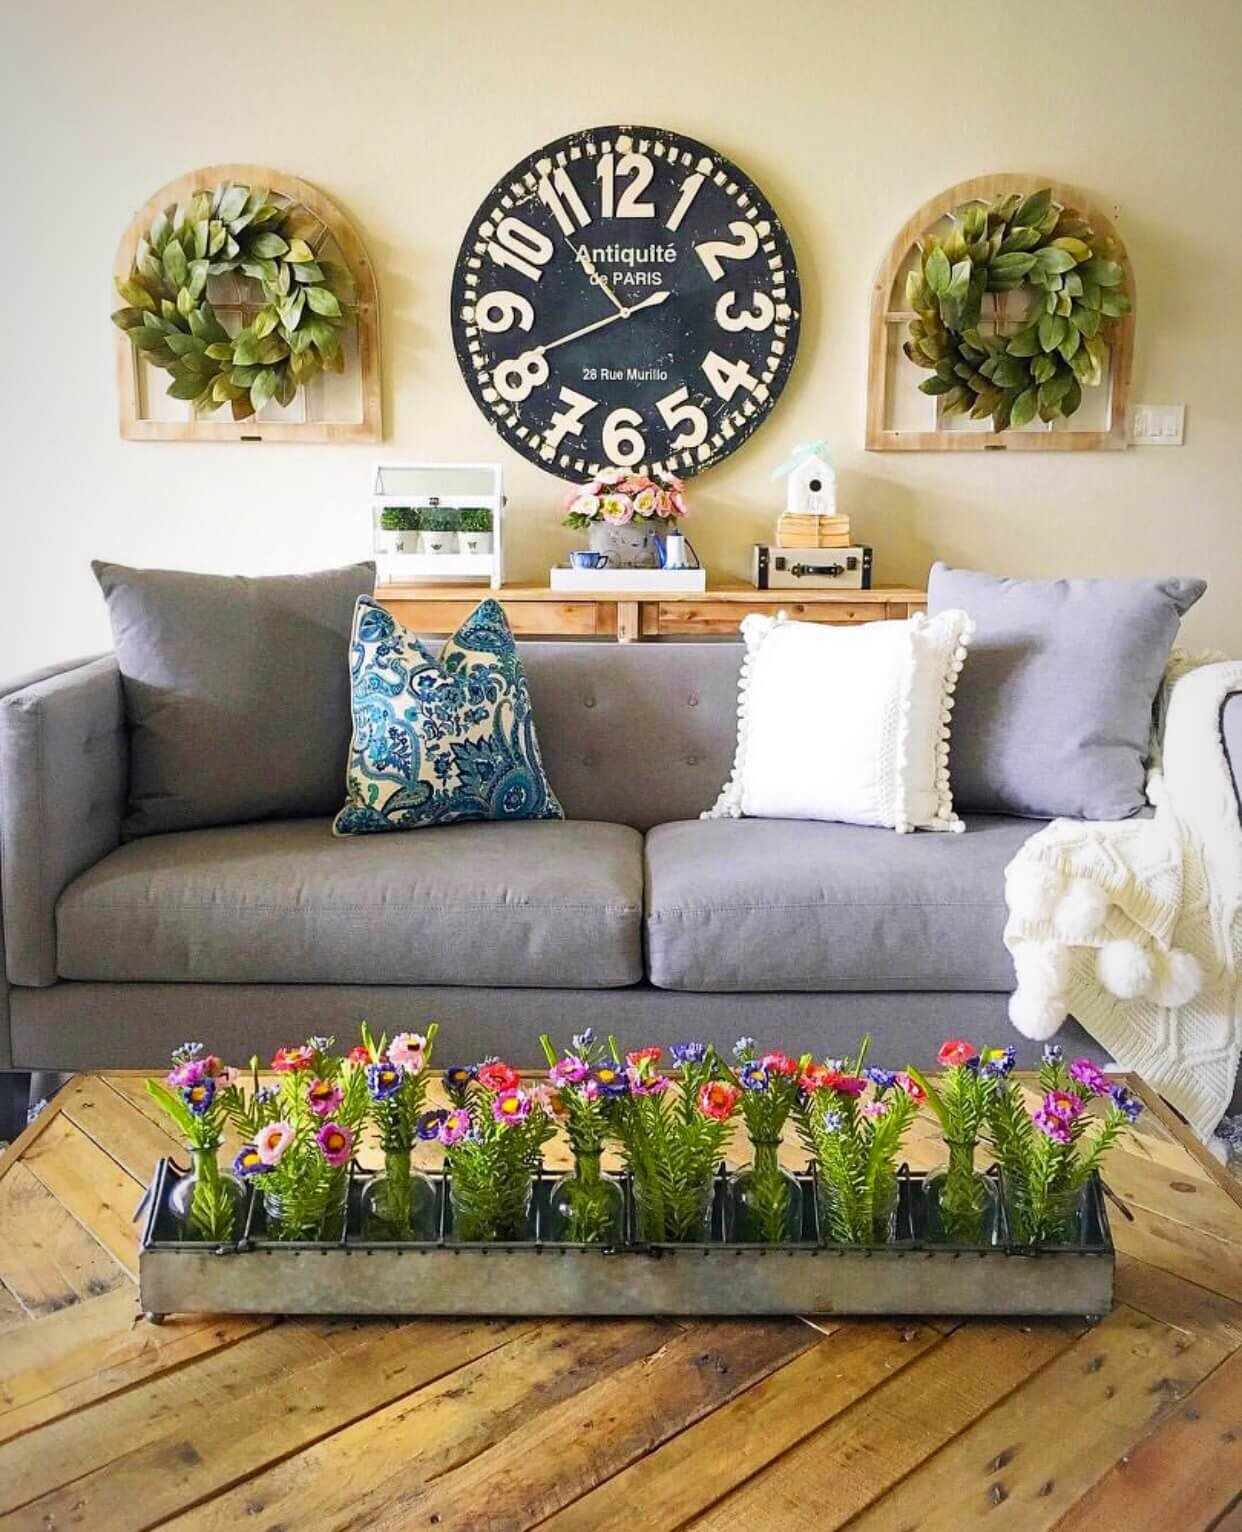 Rustic Living Room Wall Decor New 33 Best Rustic Living Room Wall Decor Ideas and Designs